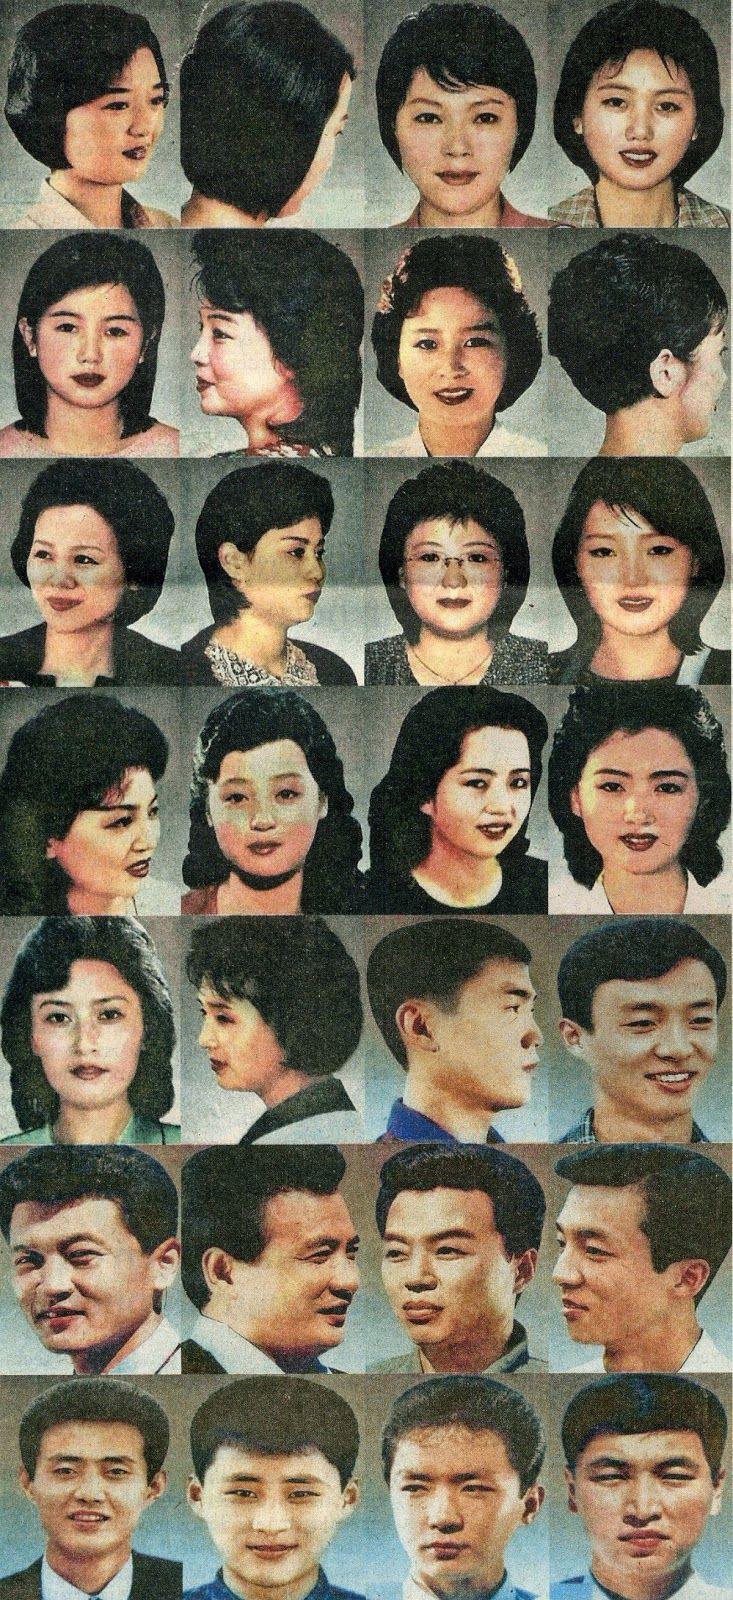 Hair Style In North Korea : North korea, Korea and US states on Pinterest